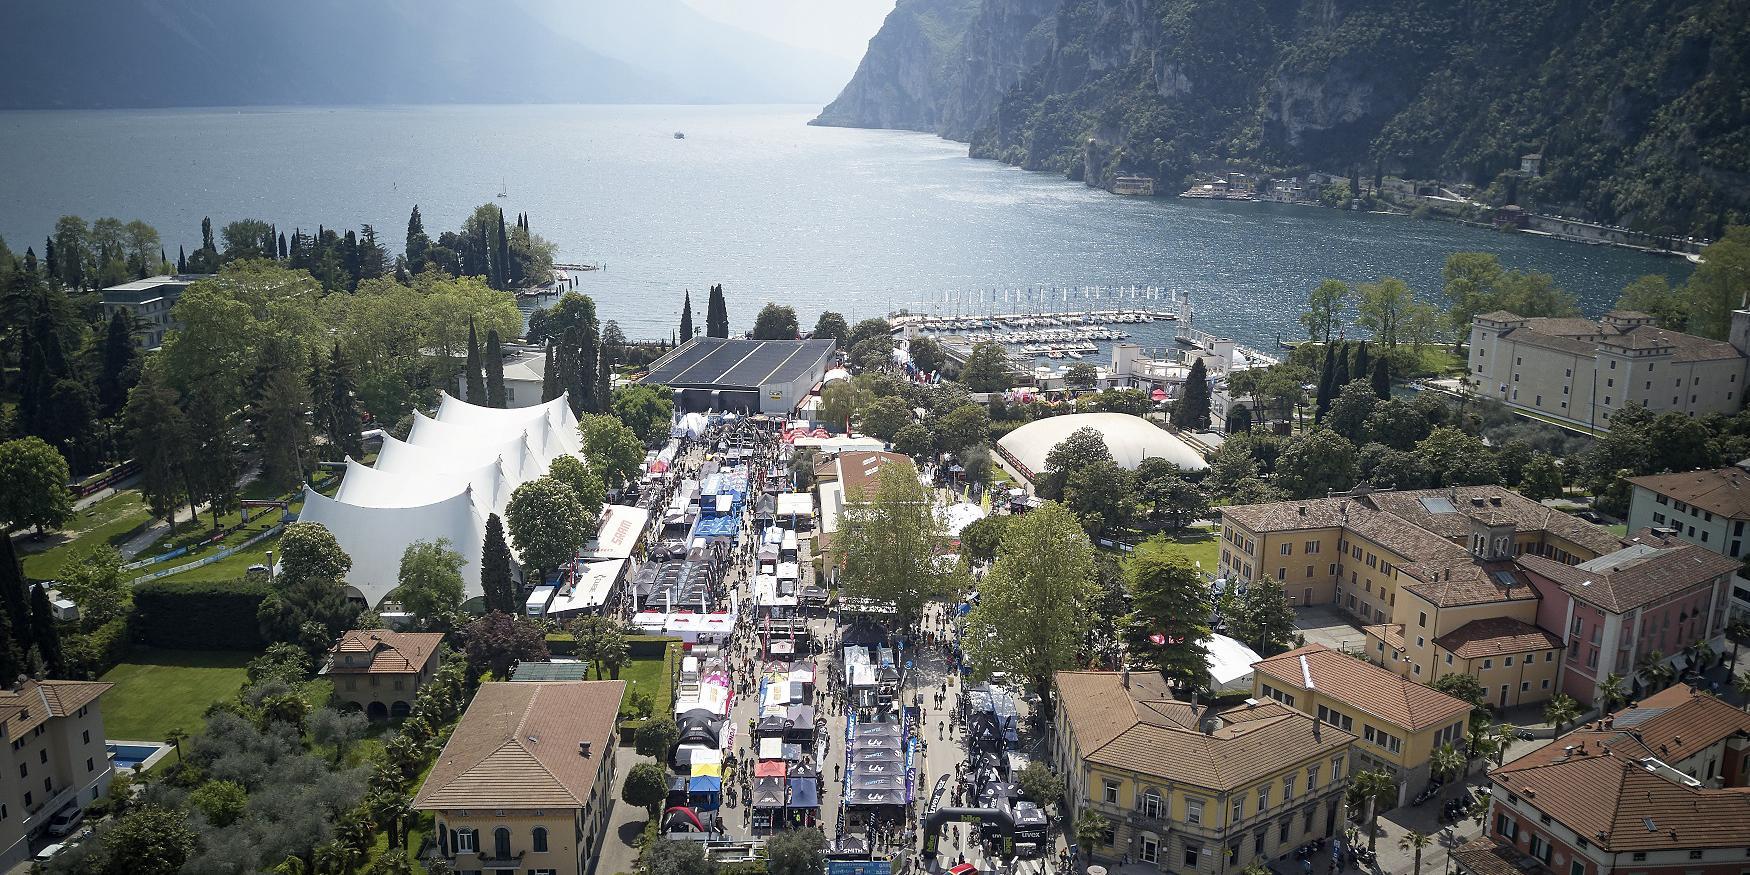 27. Bike Festival Garda Trentino